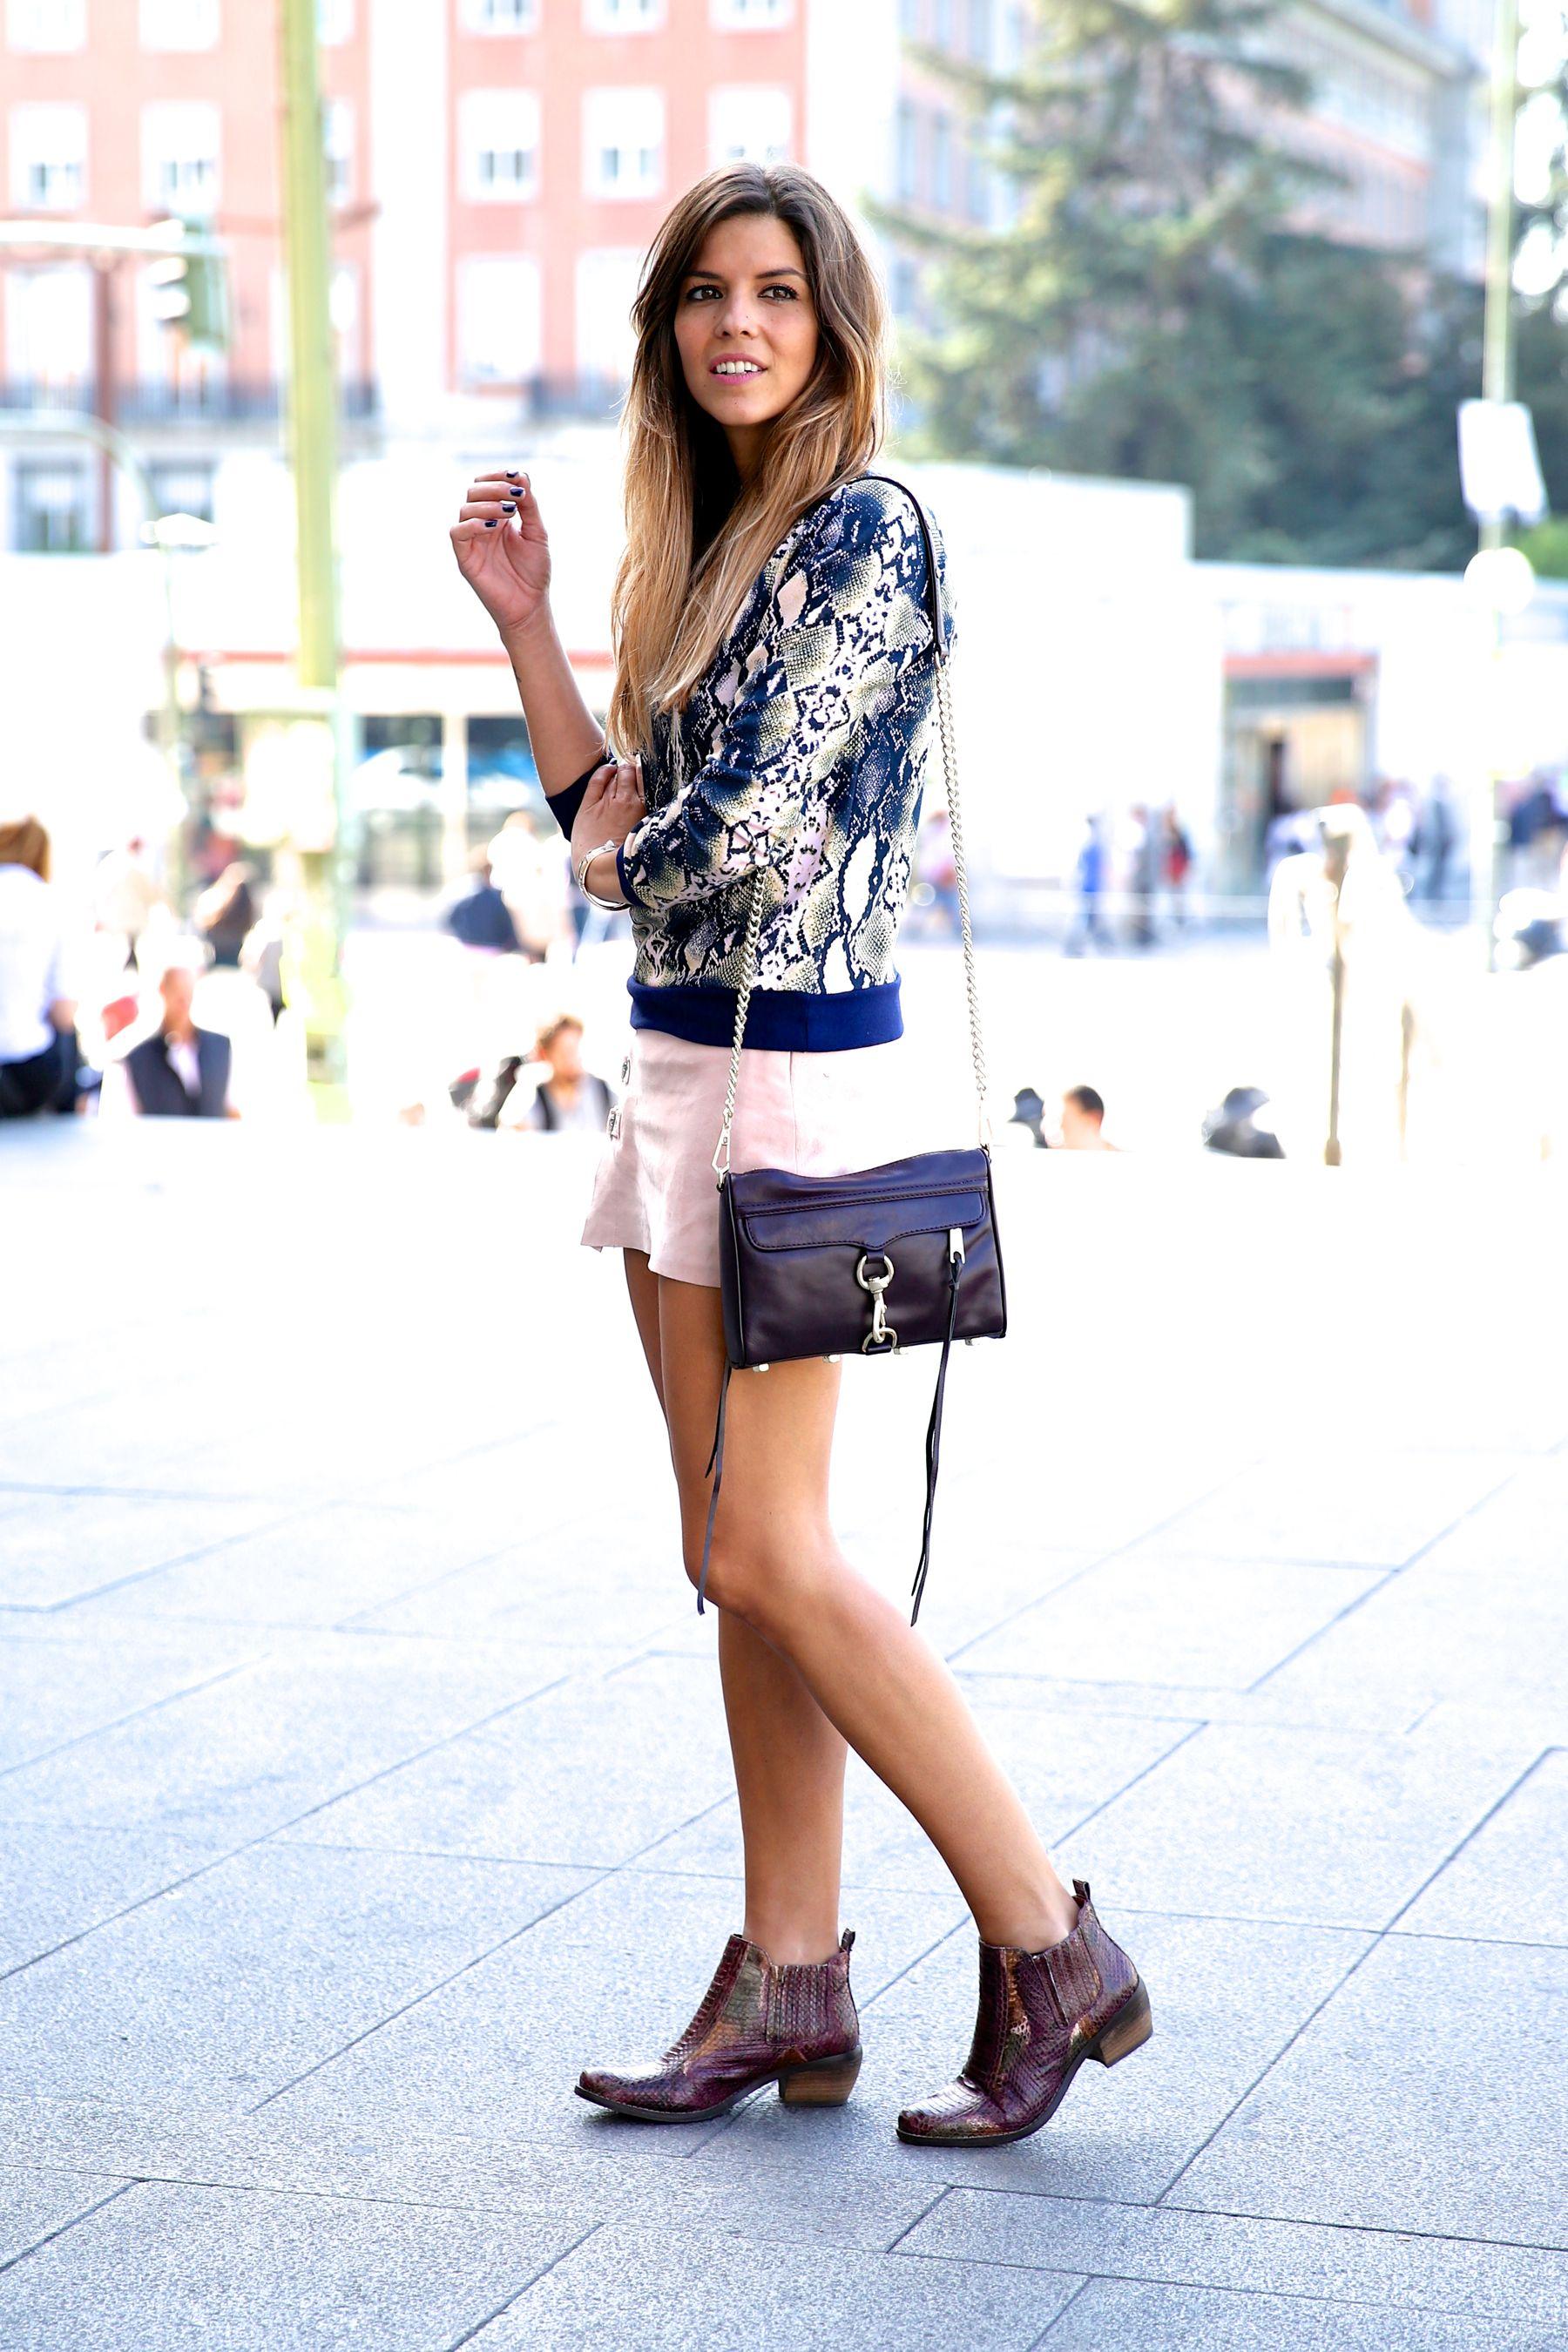 trendy_taste-look-outfit-street_style-ootd-blog-blogger-fashion_spain-moda_españa-girissima.com-sweatshirt-sudadera-estampado-crocodile-cocodrilo-botines-booties-pink_skirt-falda_rosa-8